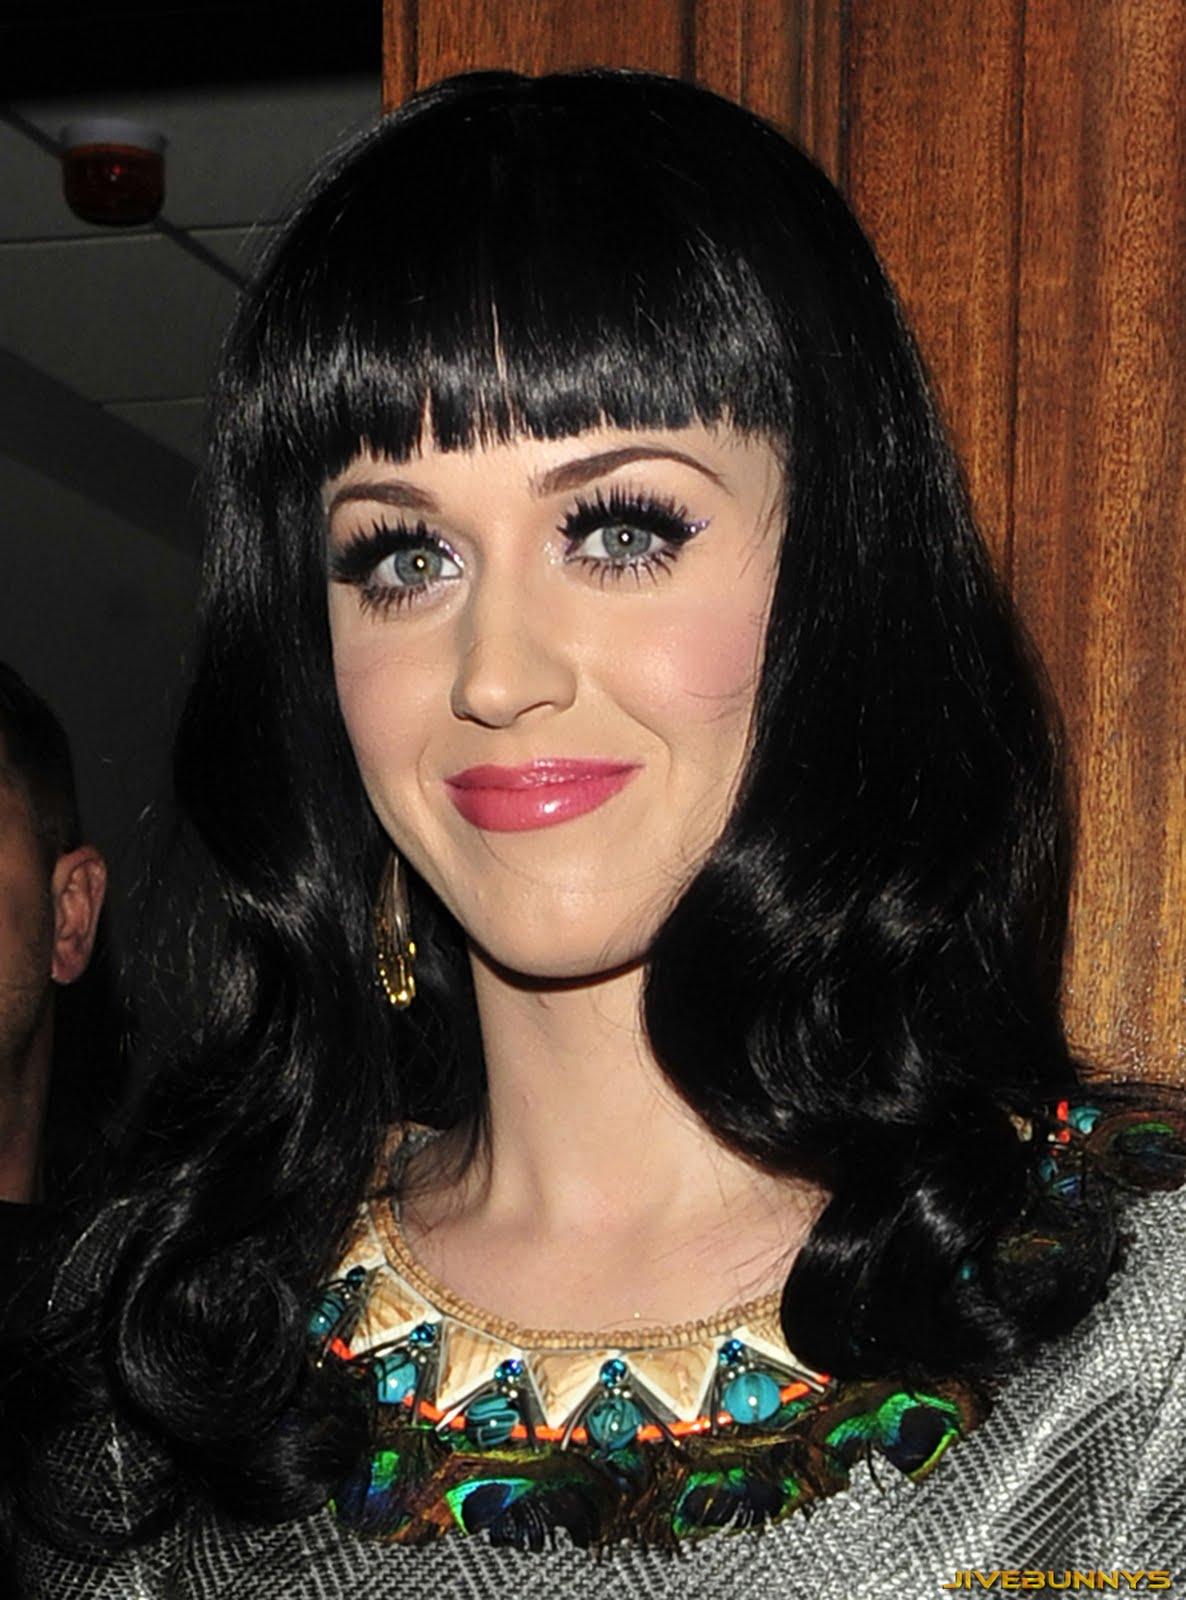 katy perry beauty singer - photo #49